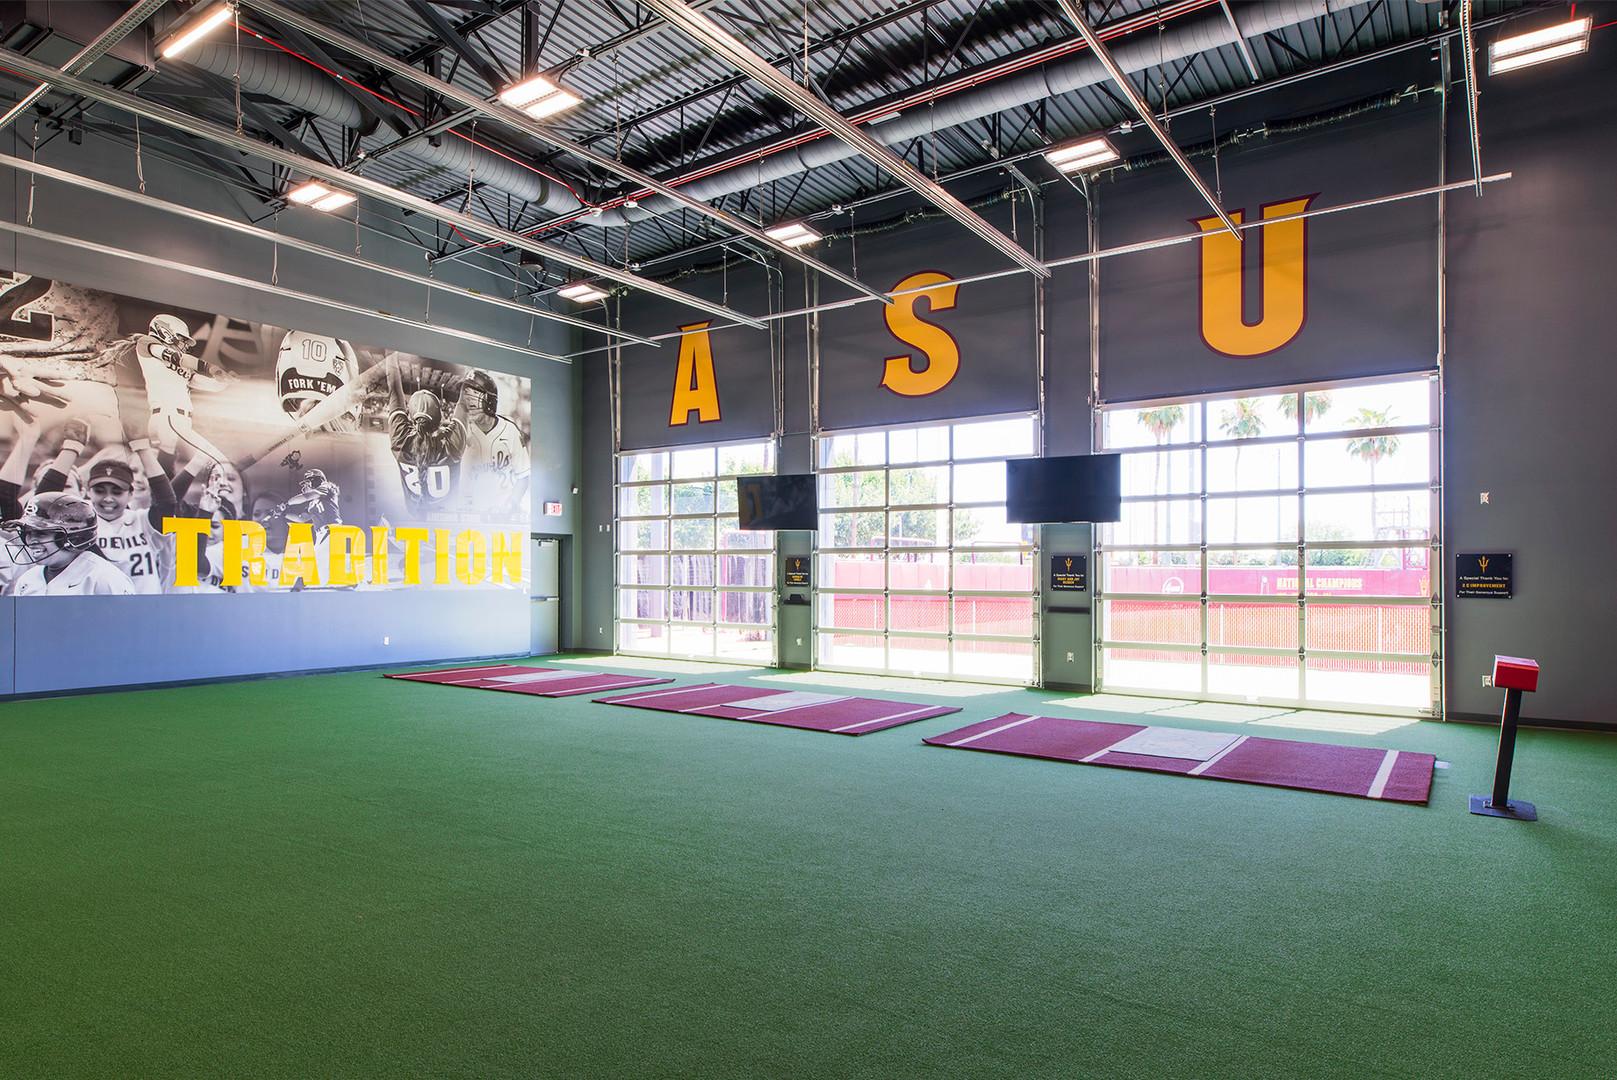 ASU Softball-07 new.jpg